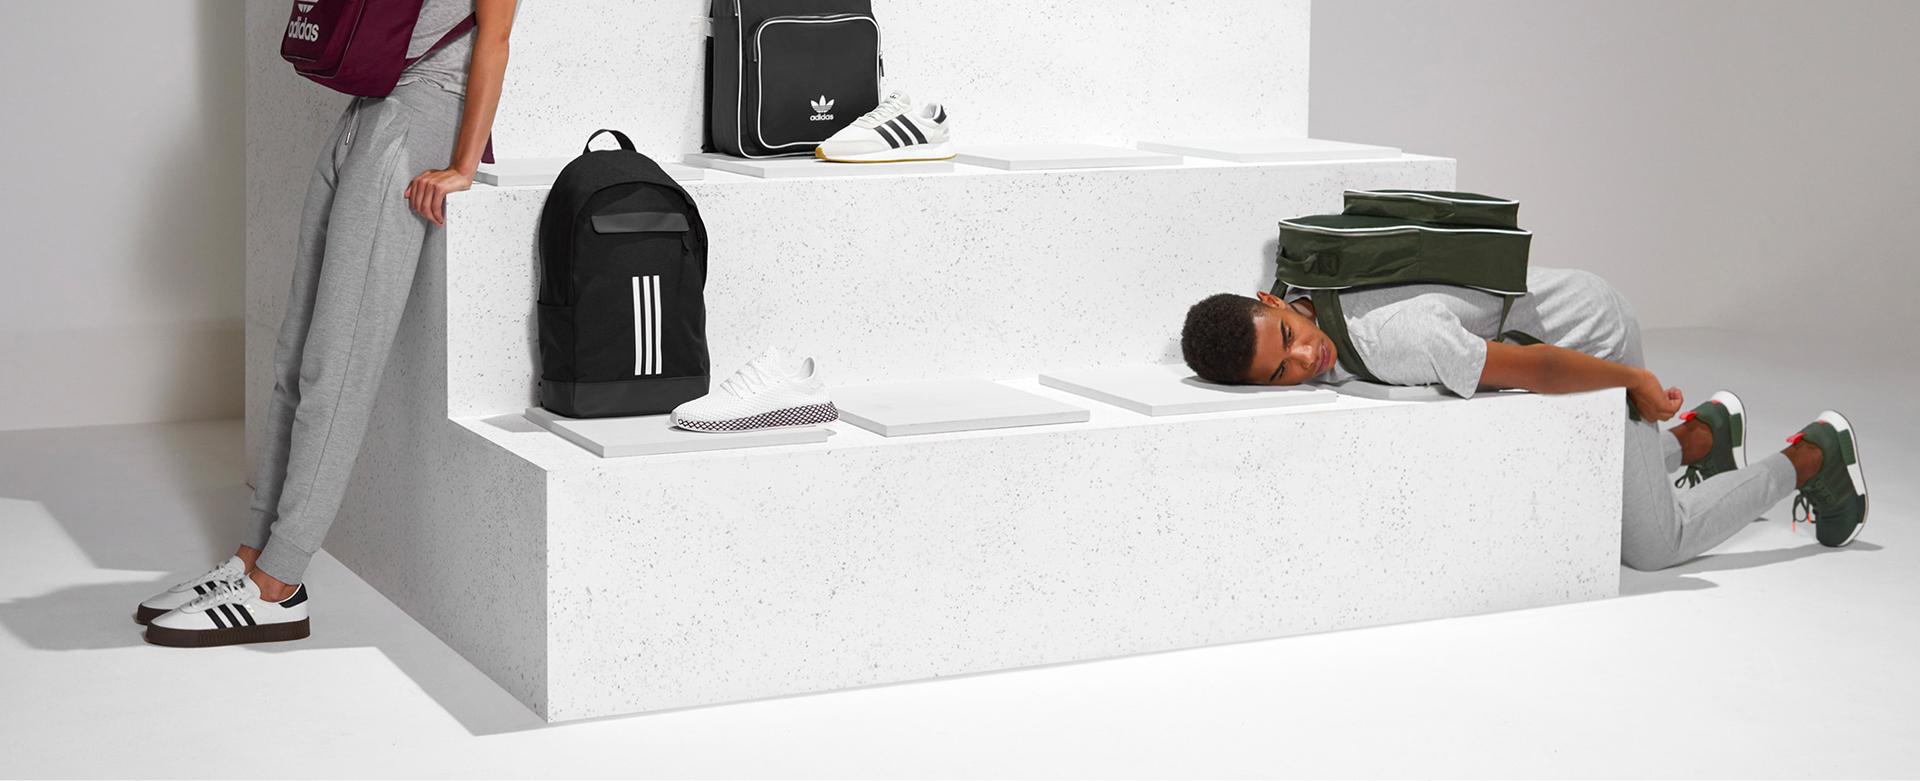 adidas-b2s-w1-image1